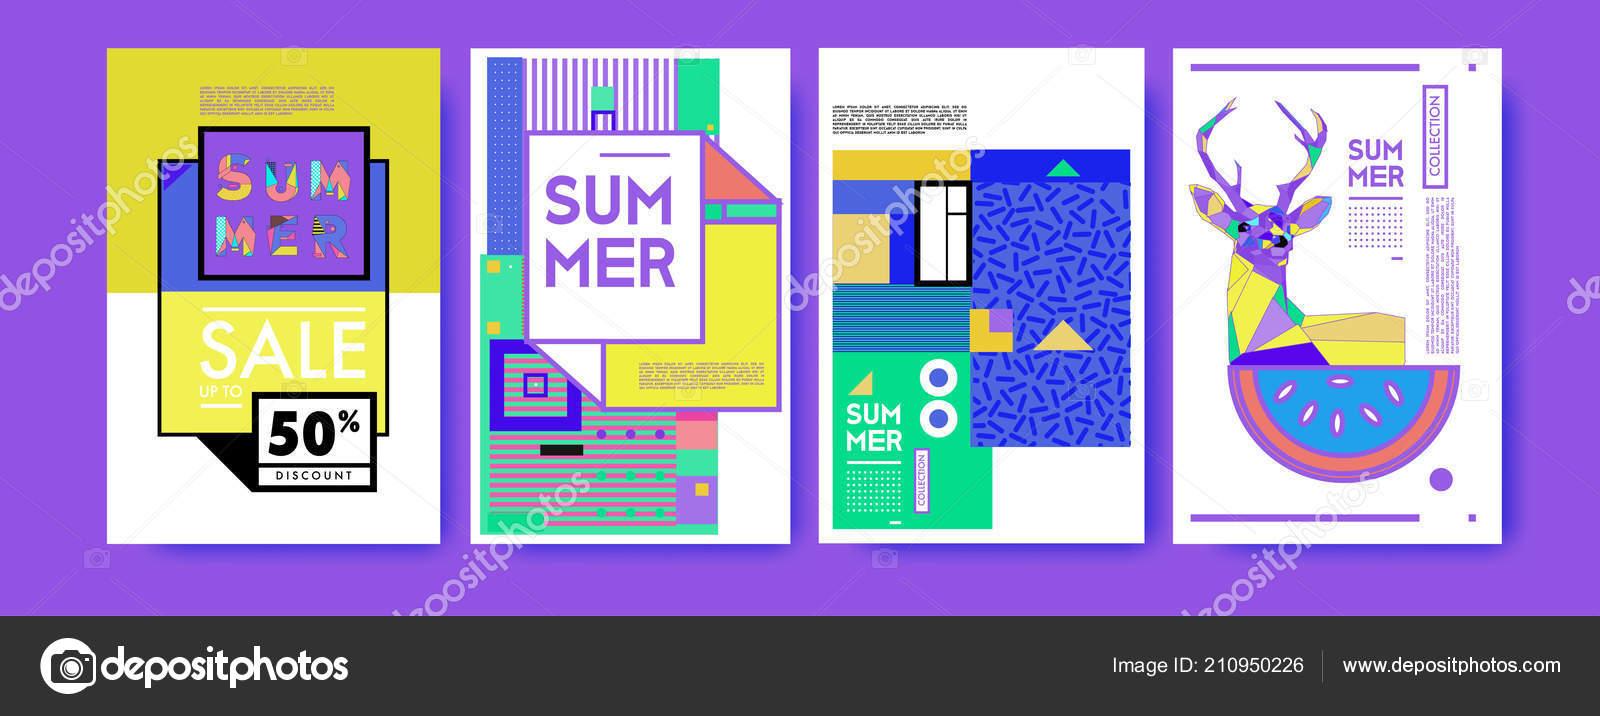 Summer Colorful Poster Design Template Set Sale Background Illustration Stock Vector